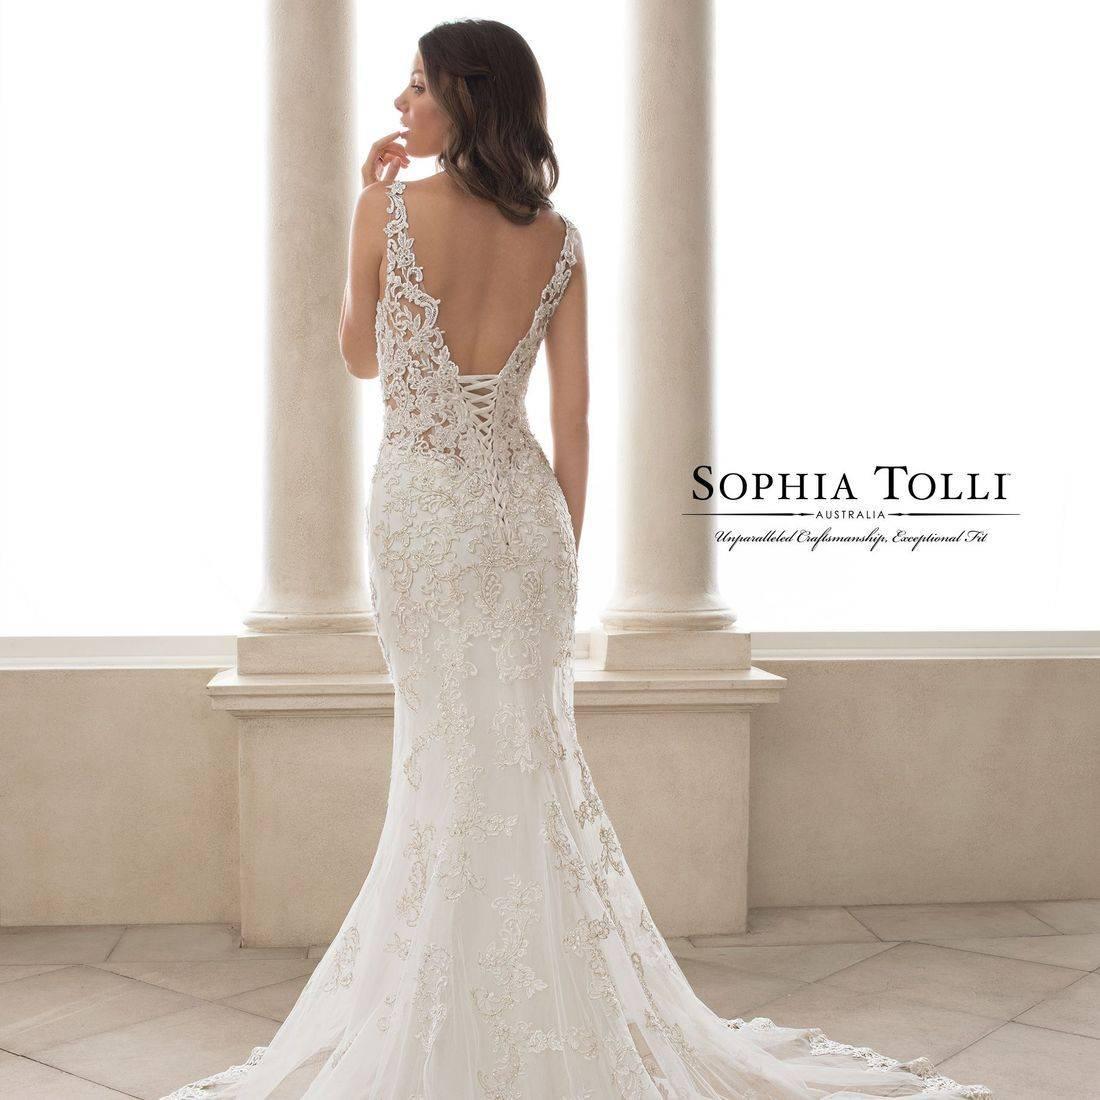 Fitted wedding dress, sophia tolli, sophia tolli wedding dress, spaghettin straps, straps, v neck, sweetheart neck, lace, plus size, deep v back, illusion,  lace up back, corset back